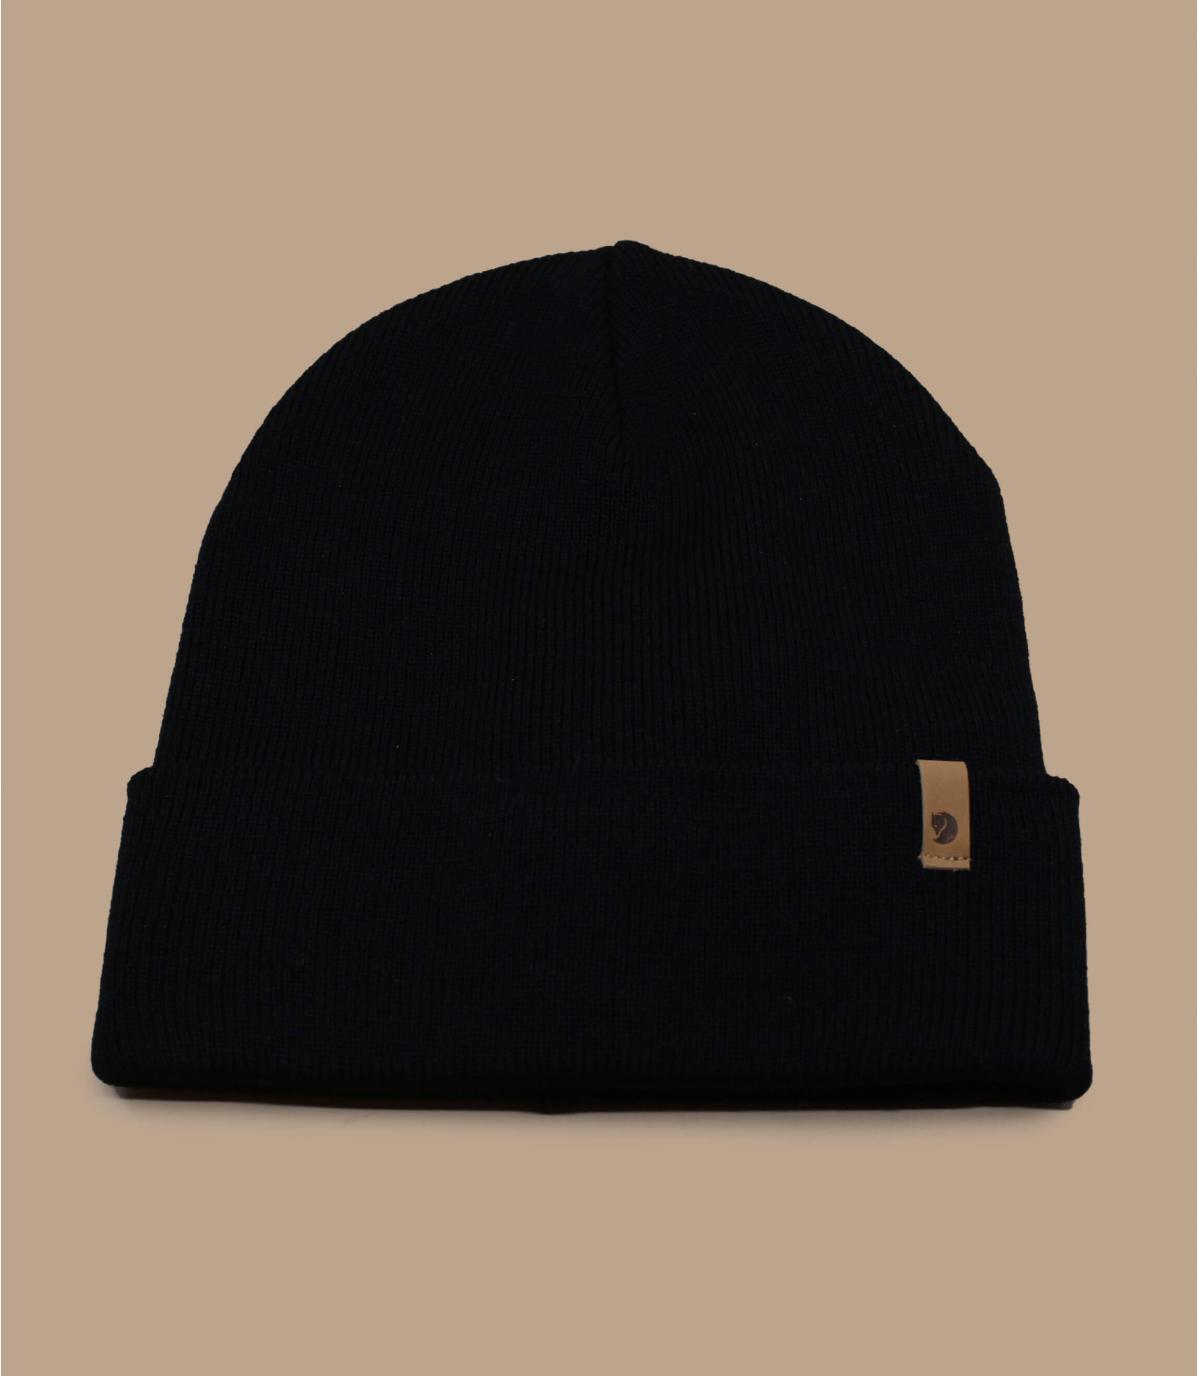 Cuff Mütze Fjällräven schwarz